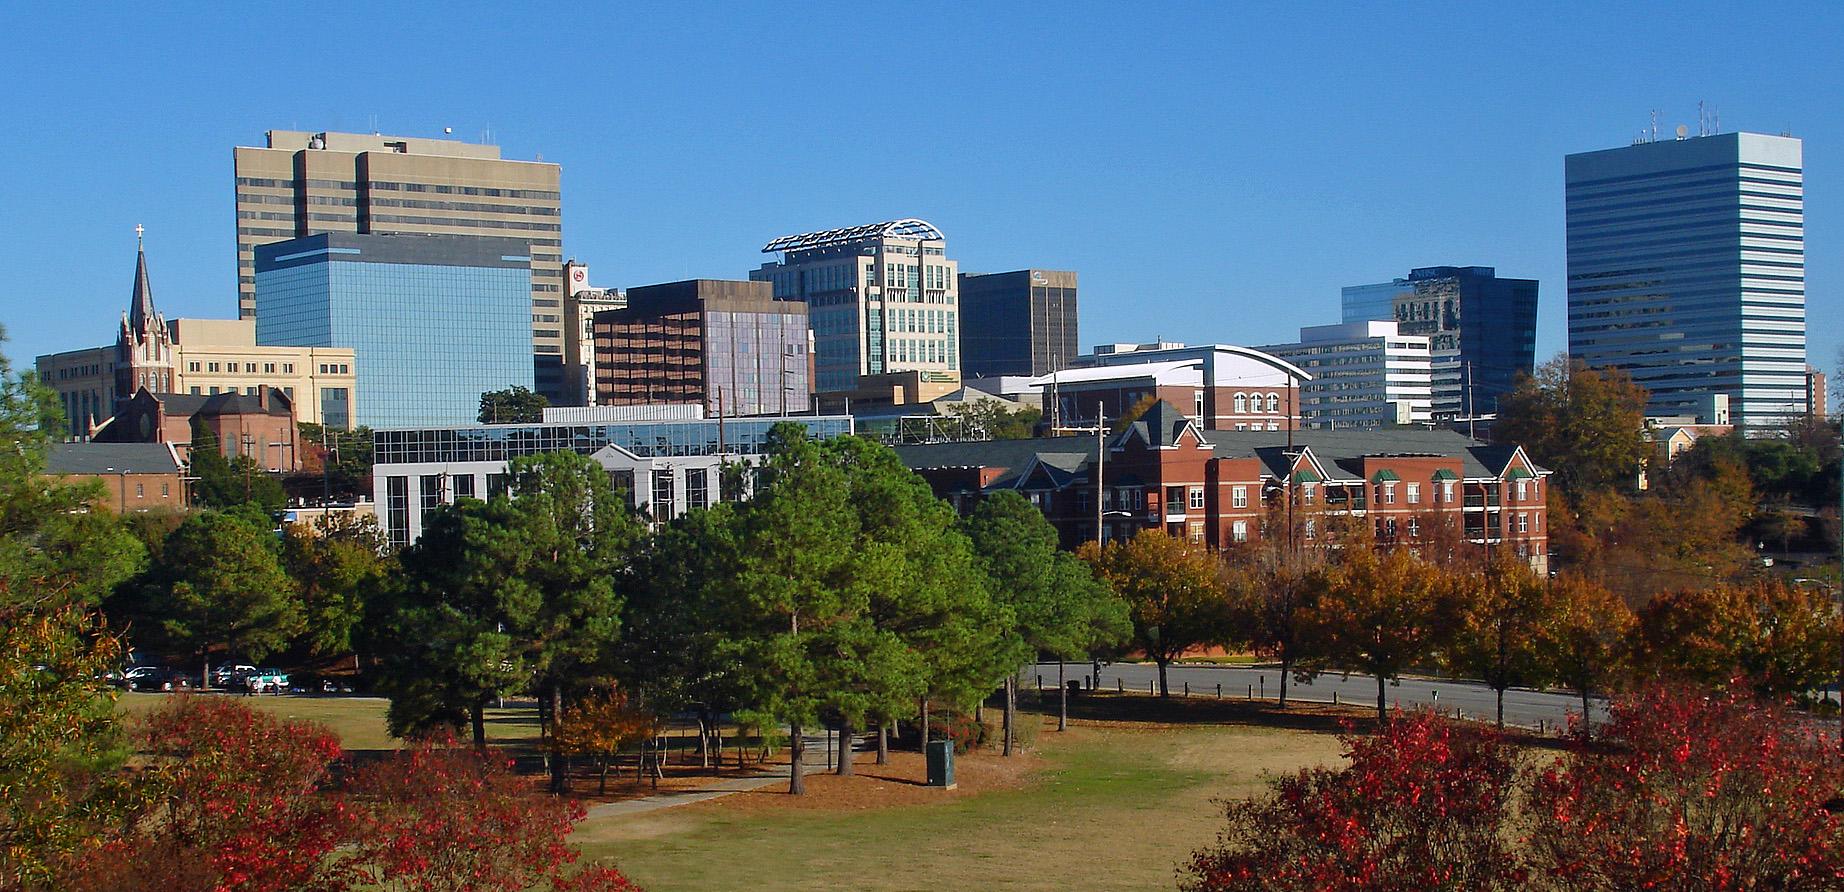 photograph of Columbia, South Carolina